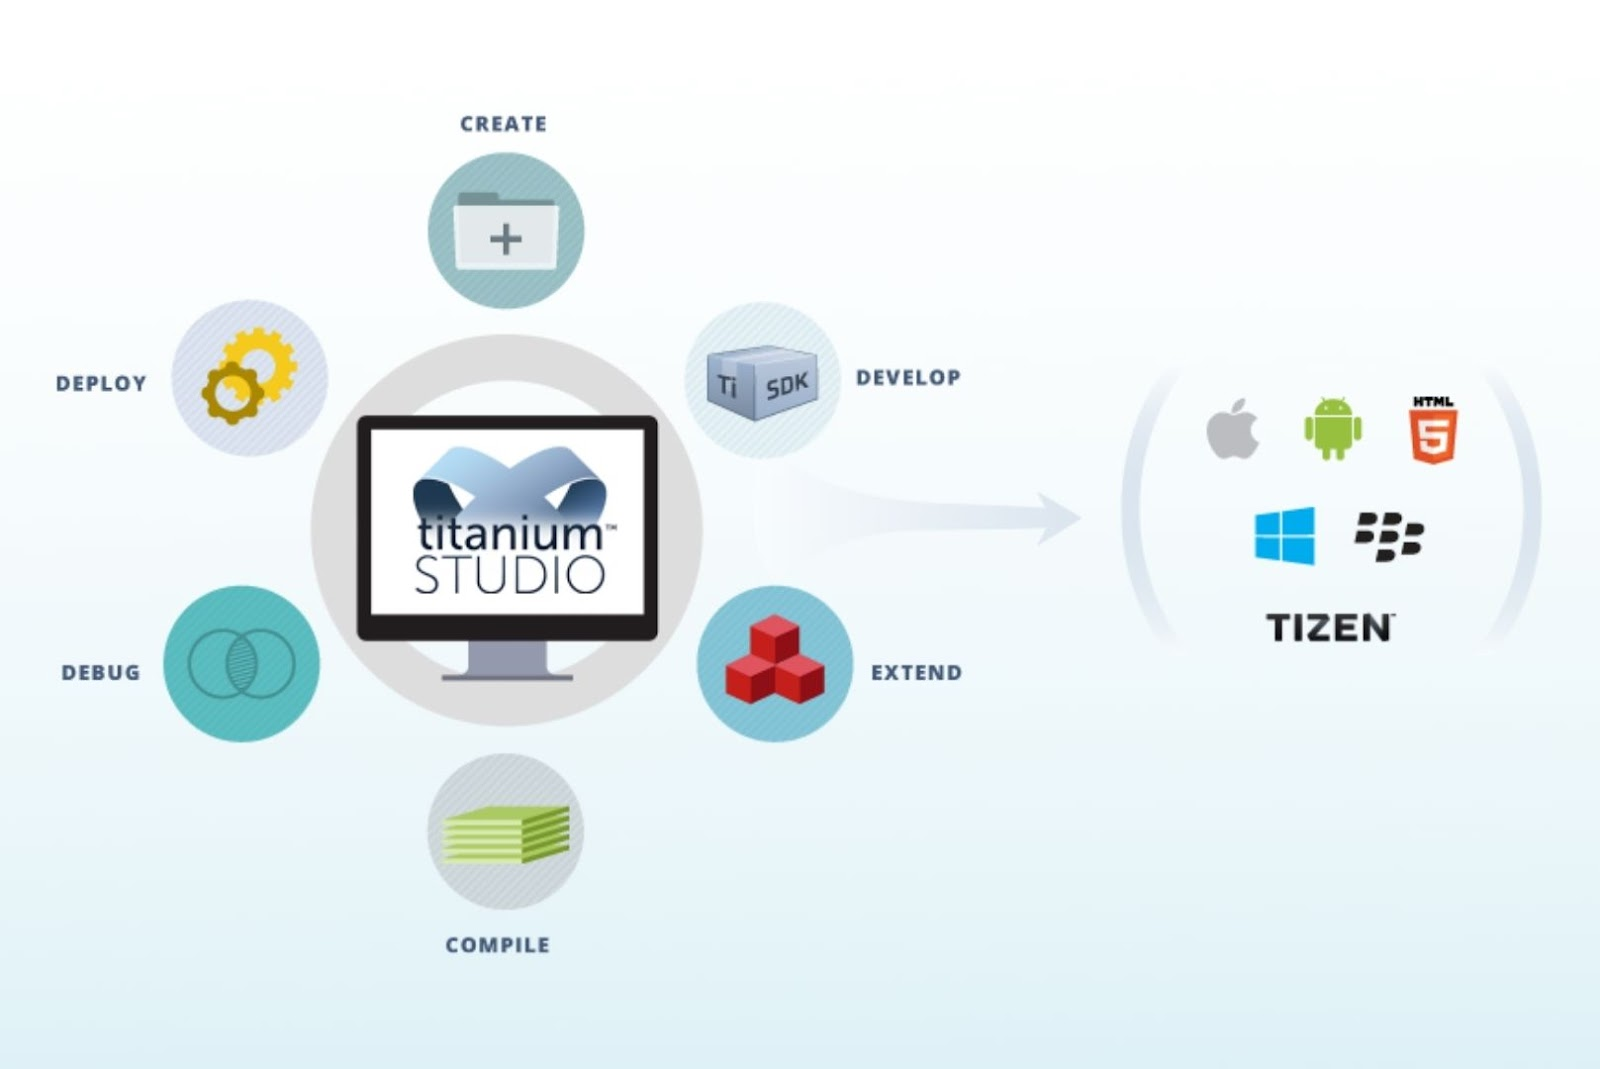 Titanium javascript framework